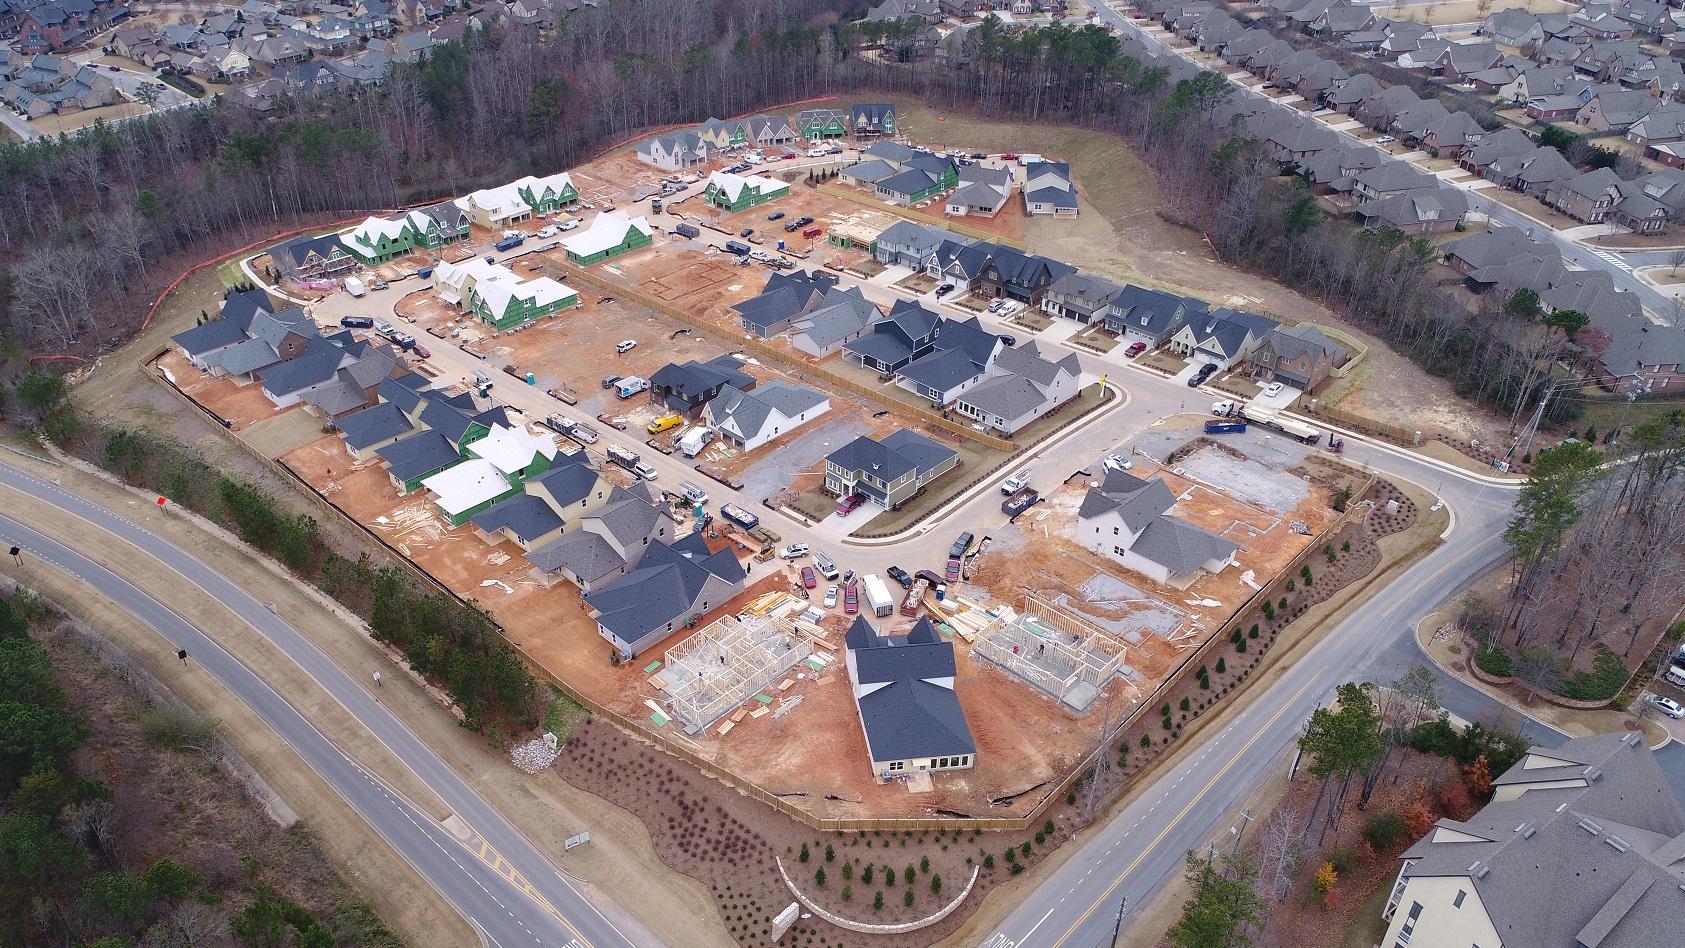 International Builders' Show to put spotlight on Alabama Power's Smart Neighborhood